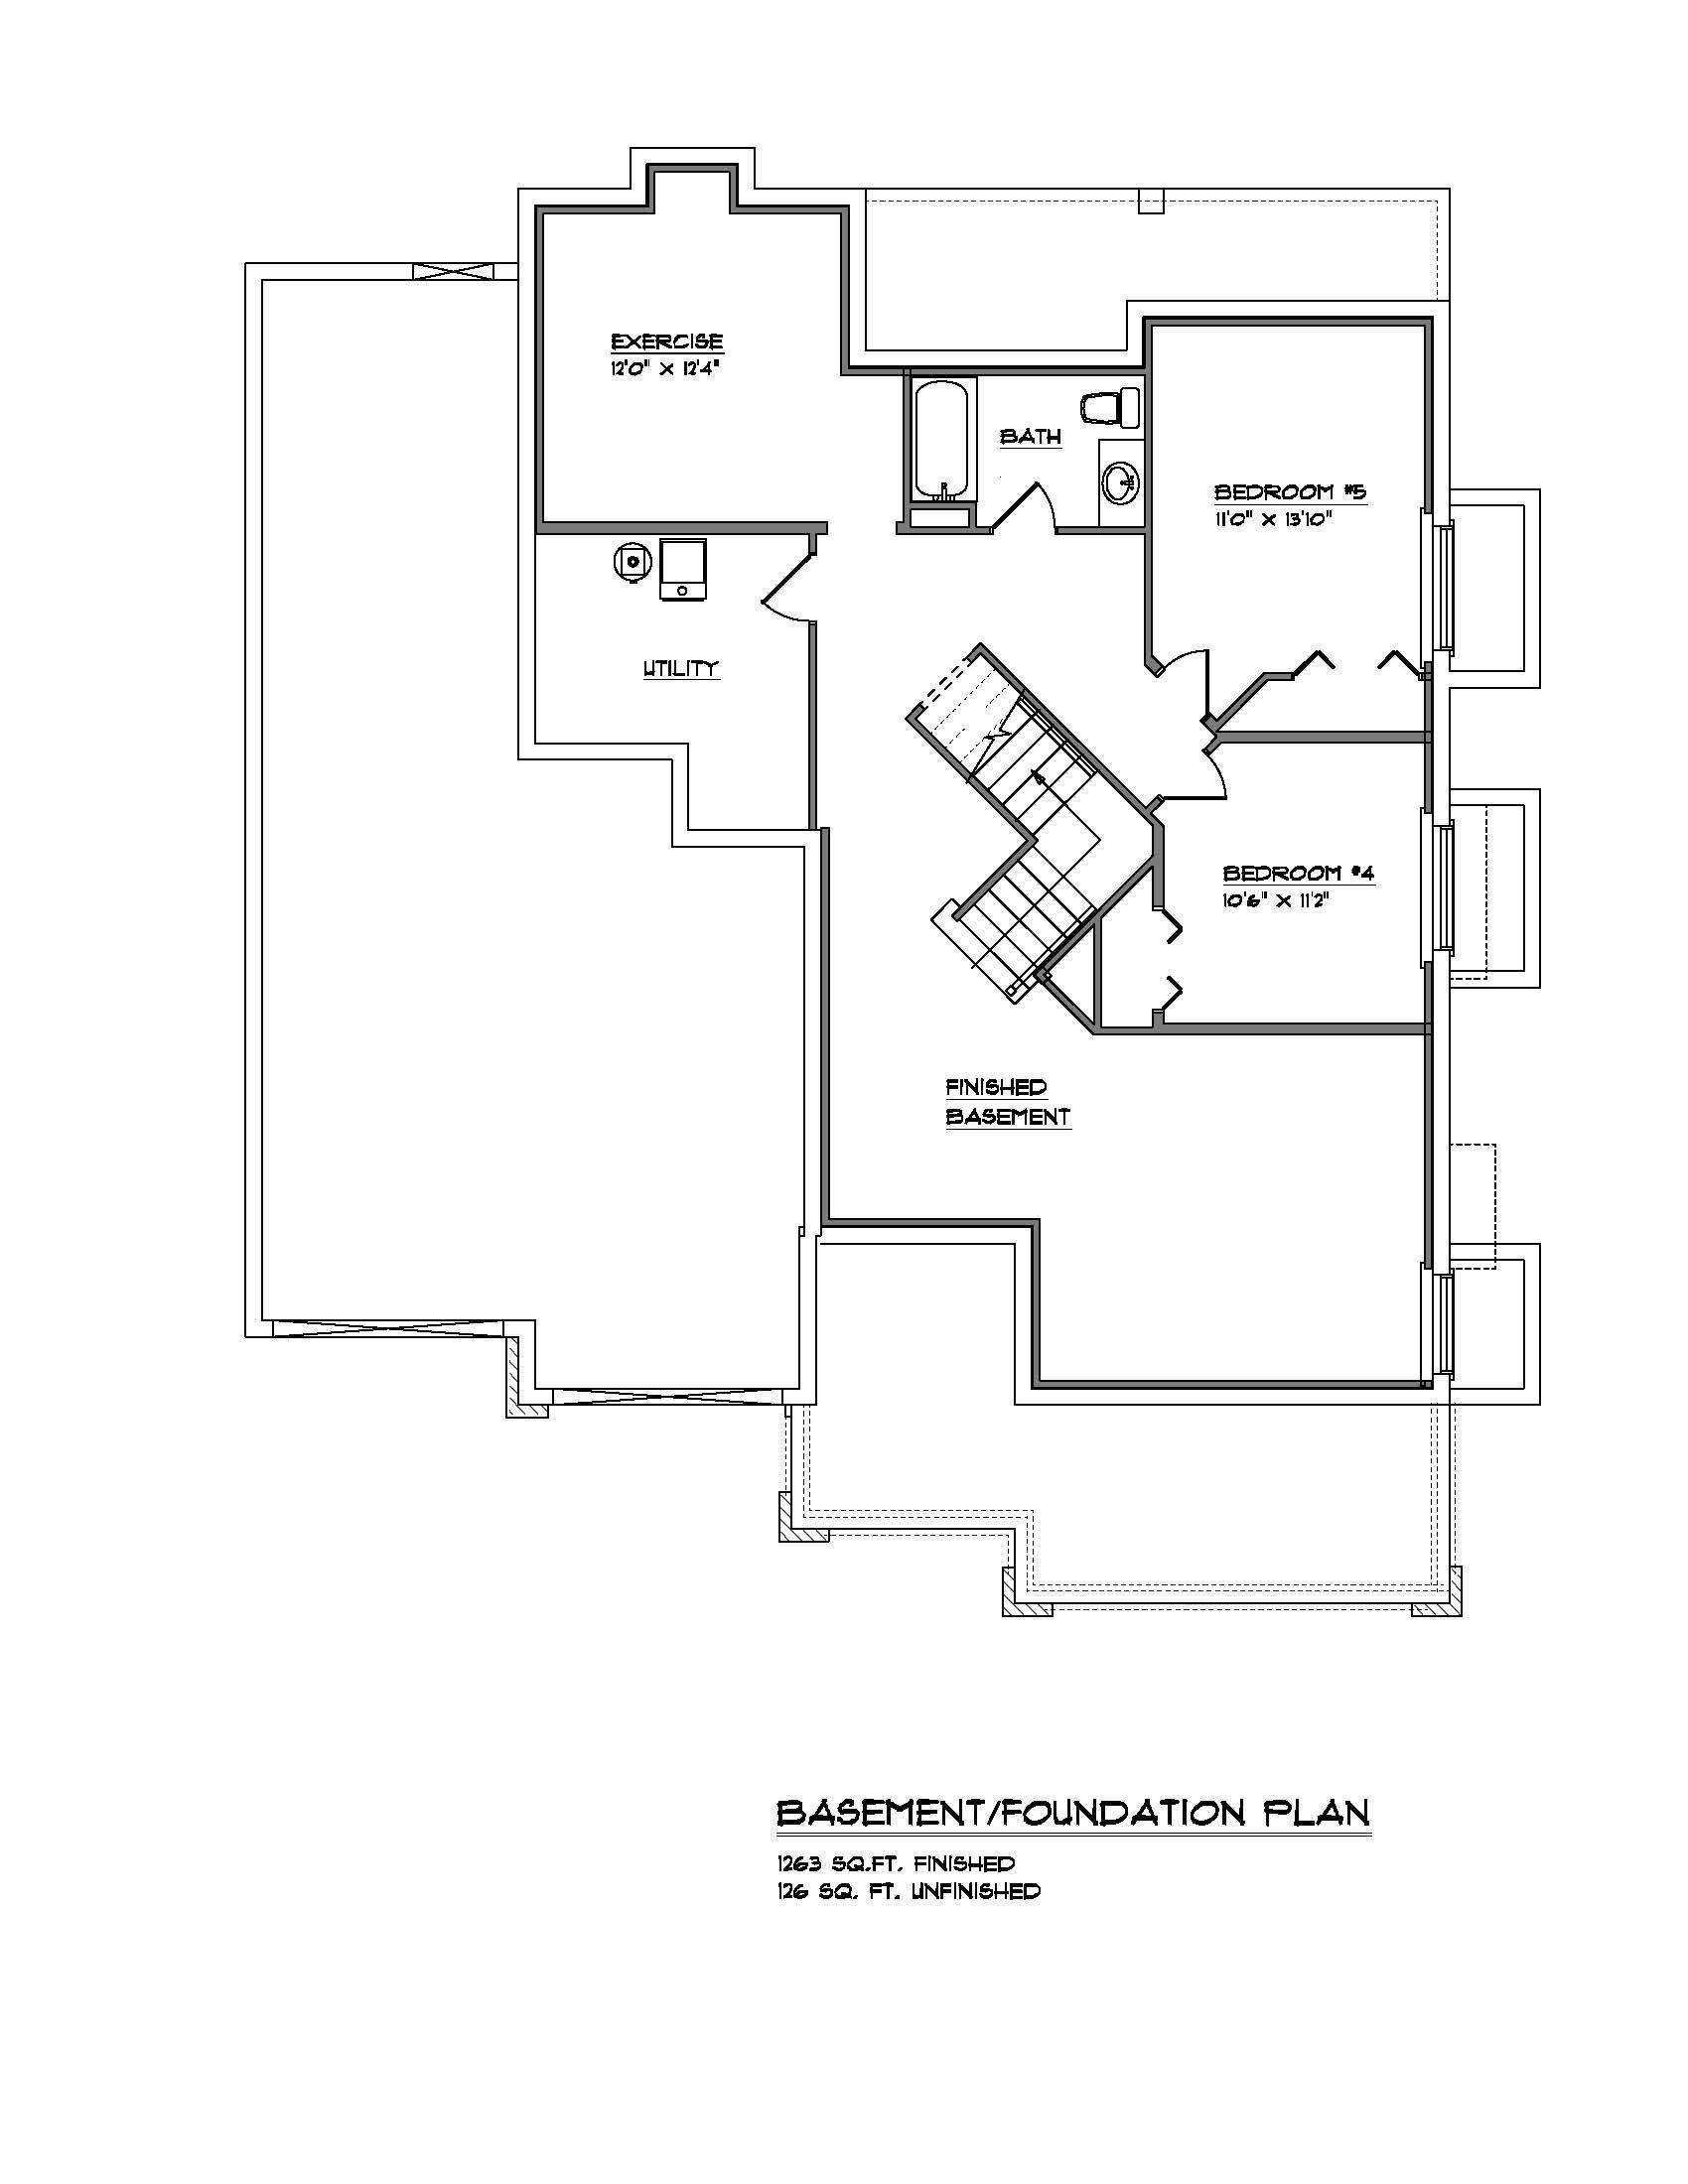 28 diamond at prospect floor plans 1 bed 1 bath apartment diamond at prospect floor plans lynwood custom home plans